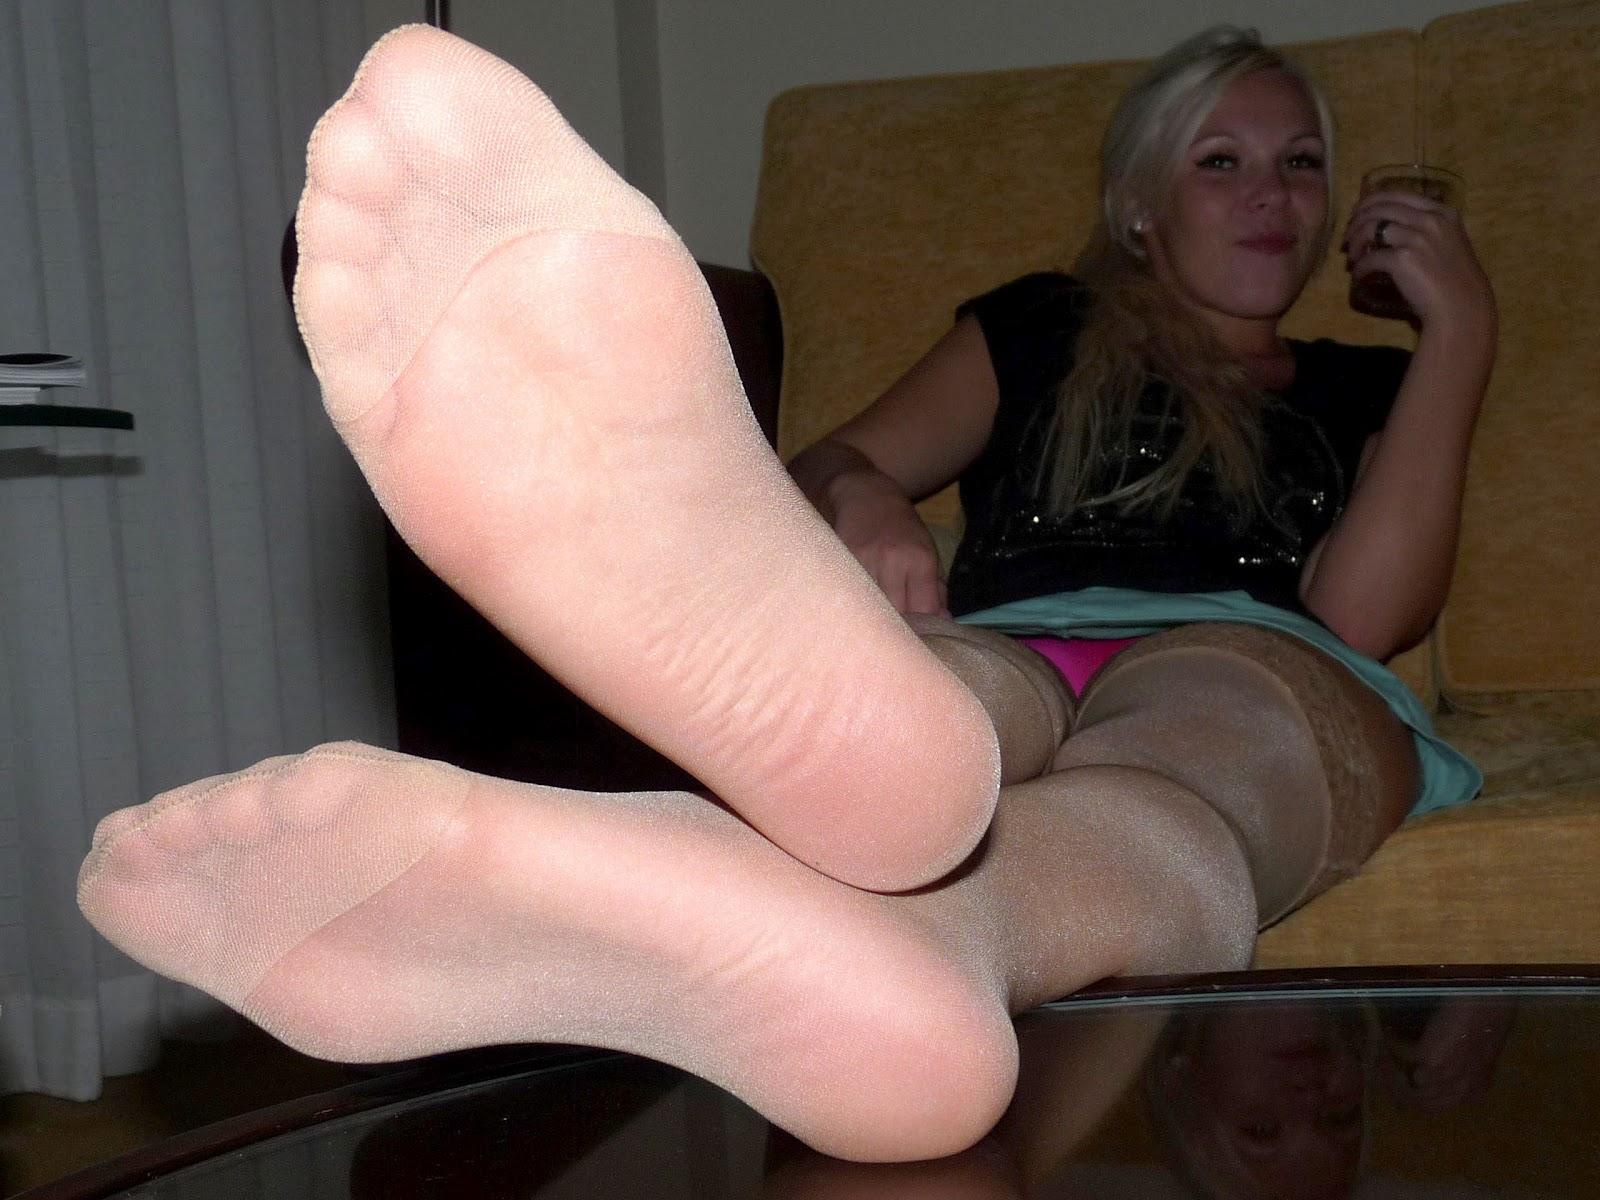 pantyhose feet candid jpg 1500x1000